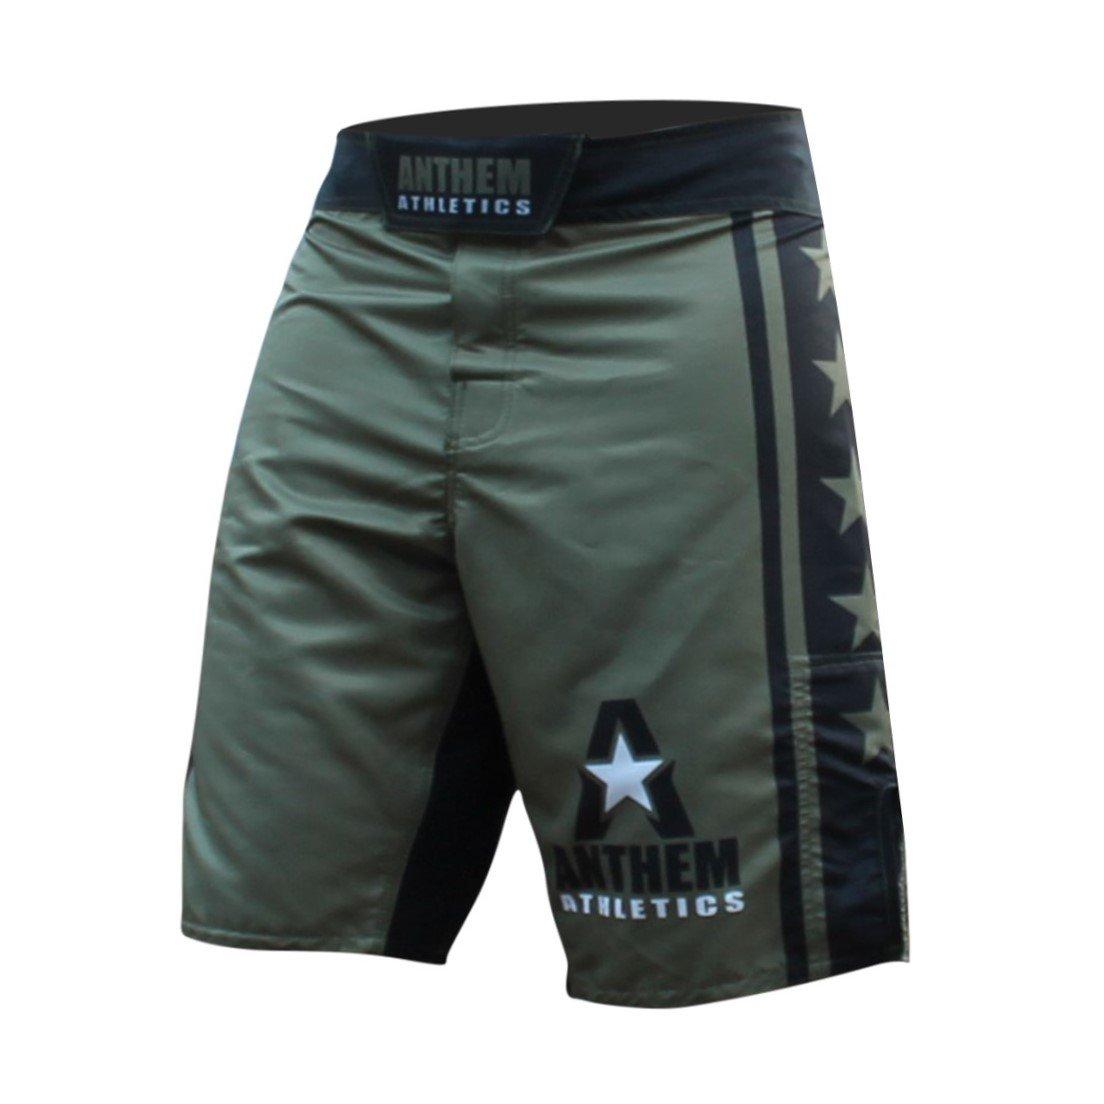 61e2ac31c75f5 Anthem Athletics Resilience MMA Shorts - 20+ Styles - Fight Shorts, BJJ,  Muay Thai, WOD, Cross-Training, OCR